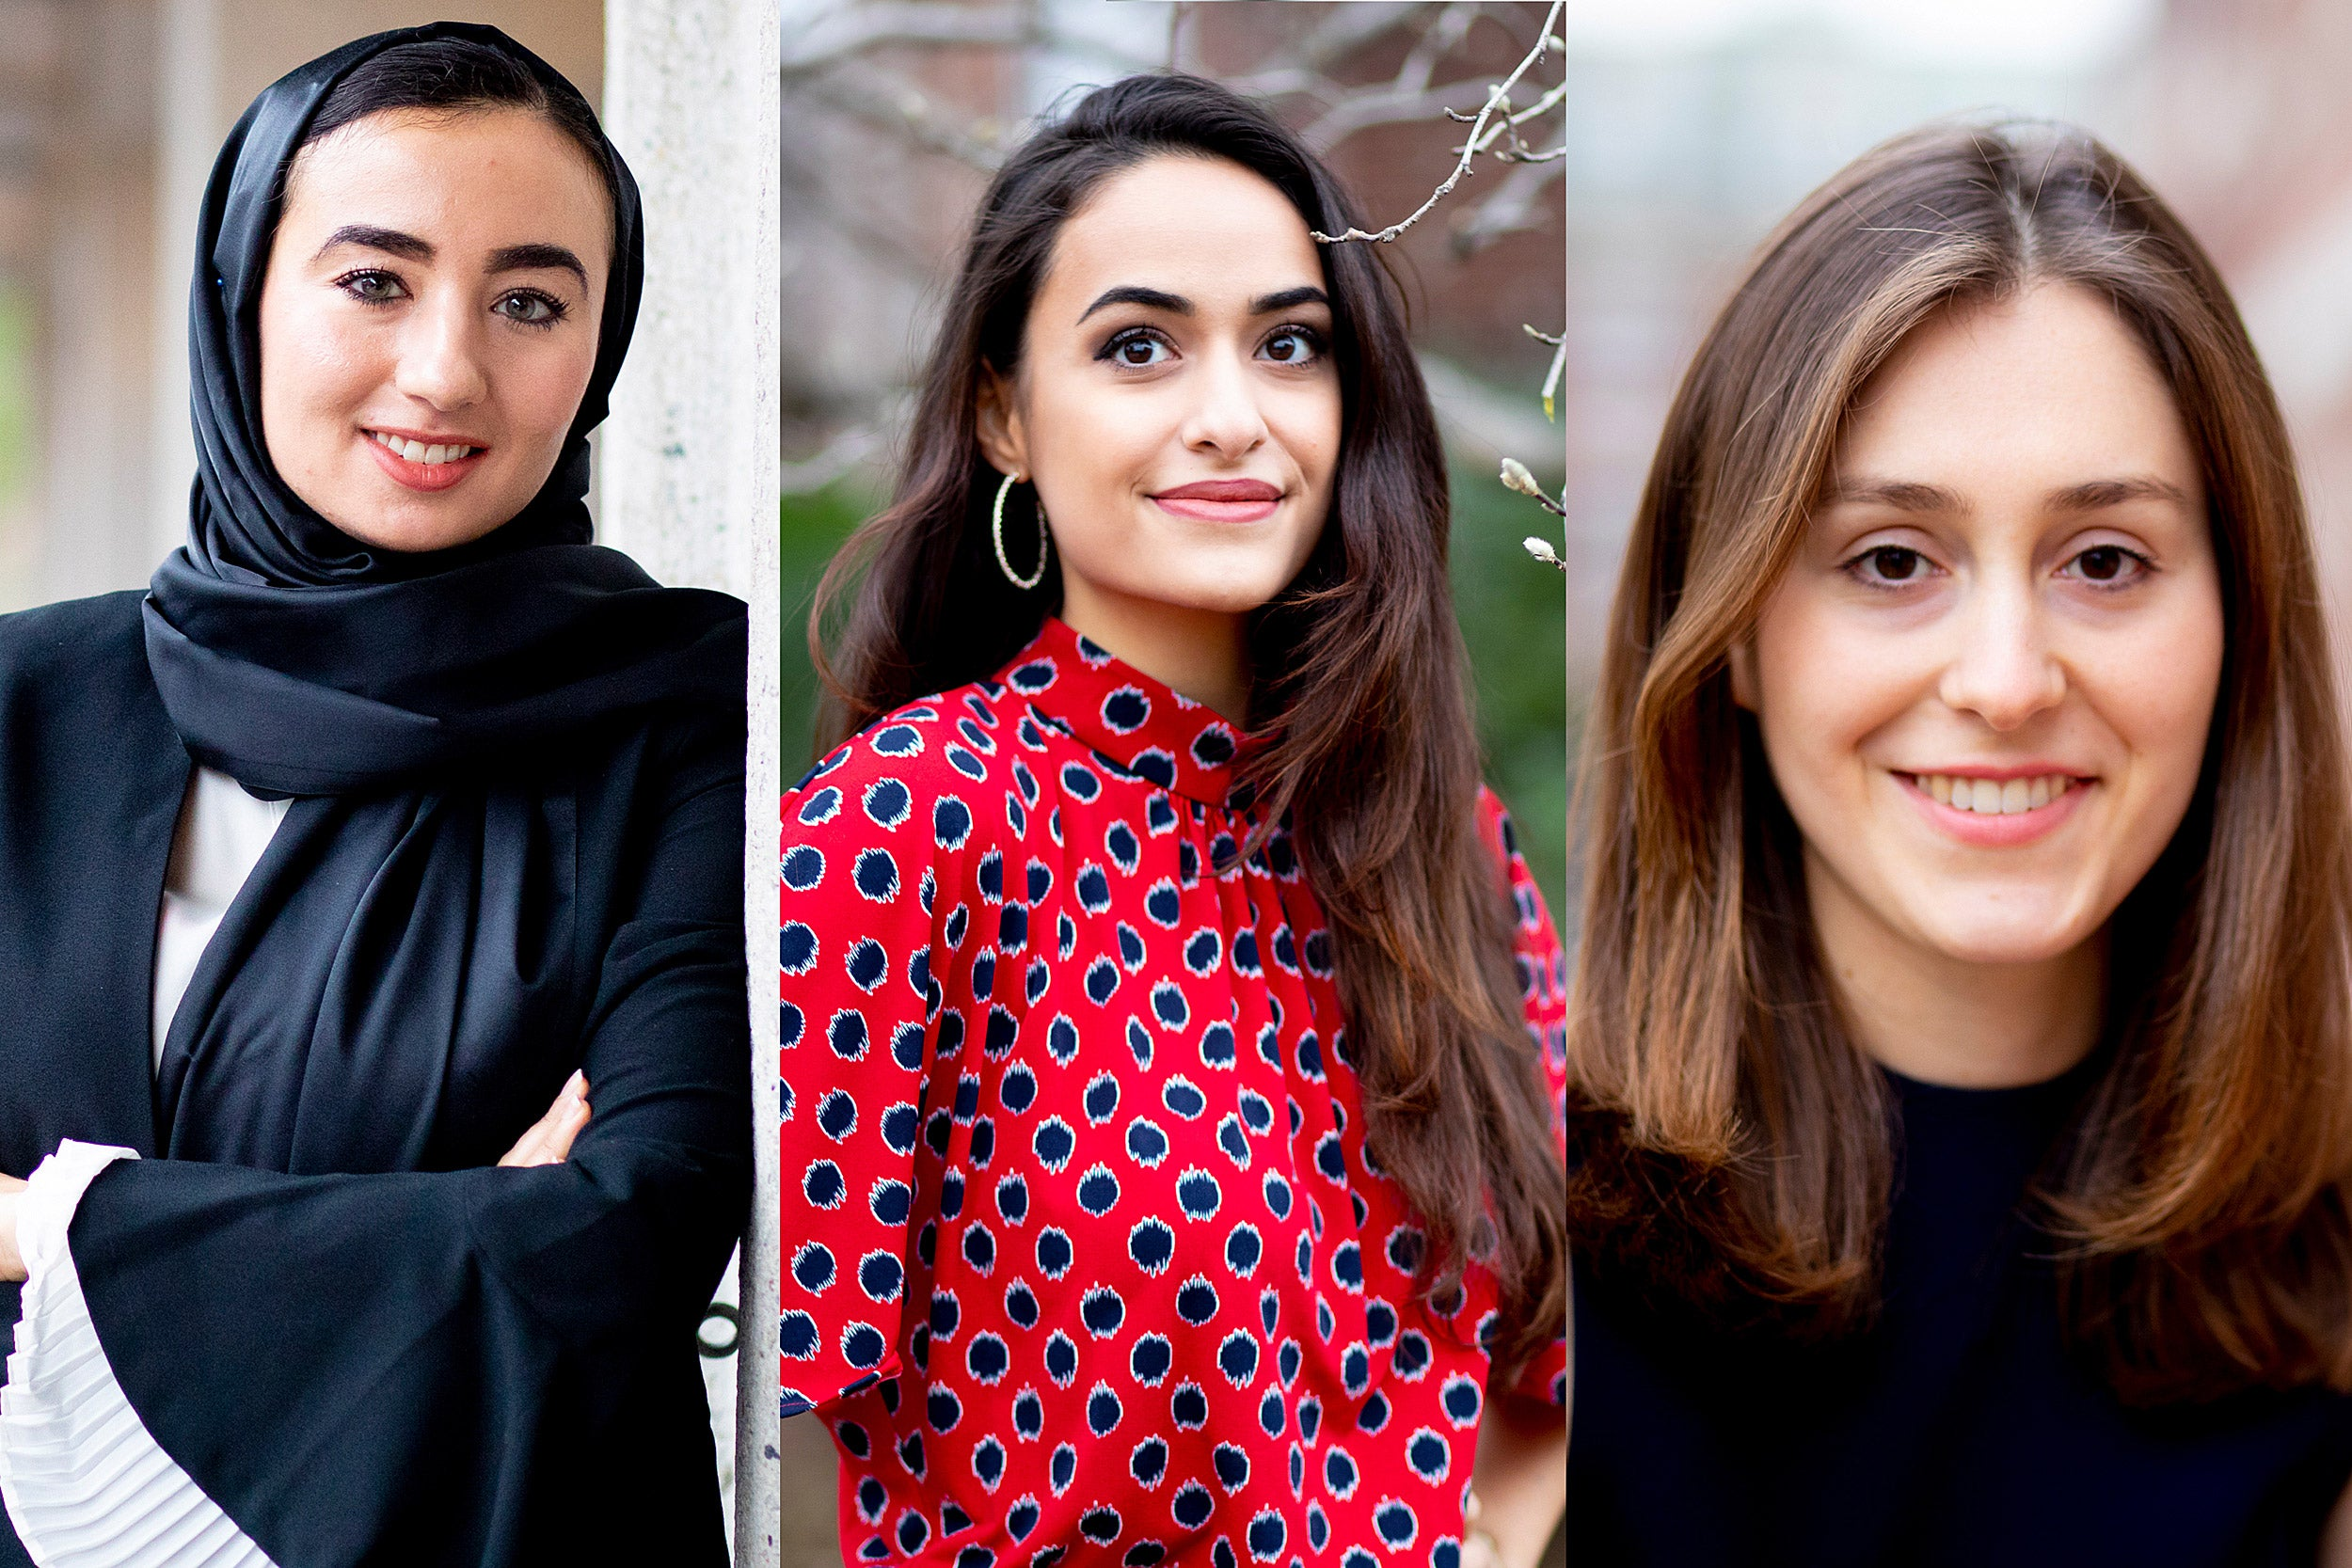 Hanaa Masalmeh, Audria Amirian, and Carolina Brettler.